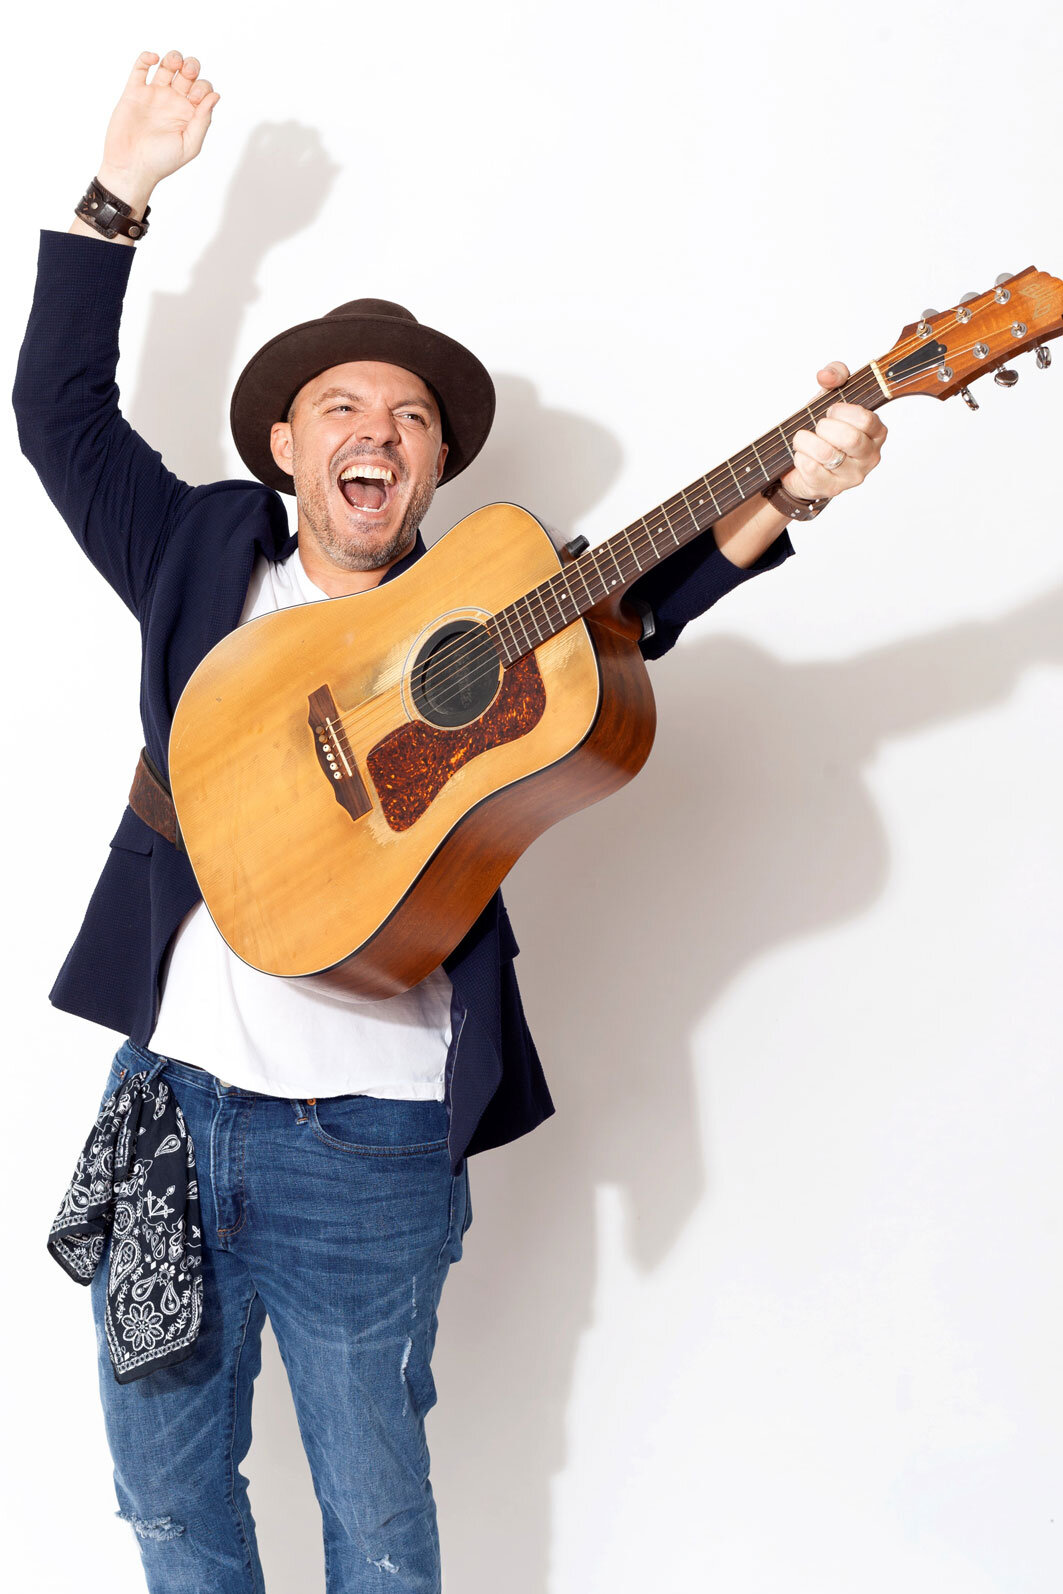 Mark Monaco, lead singer of Monaco and the Strayhearts